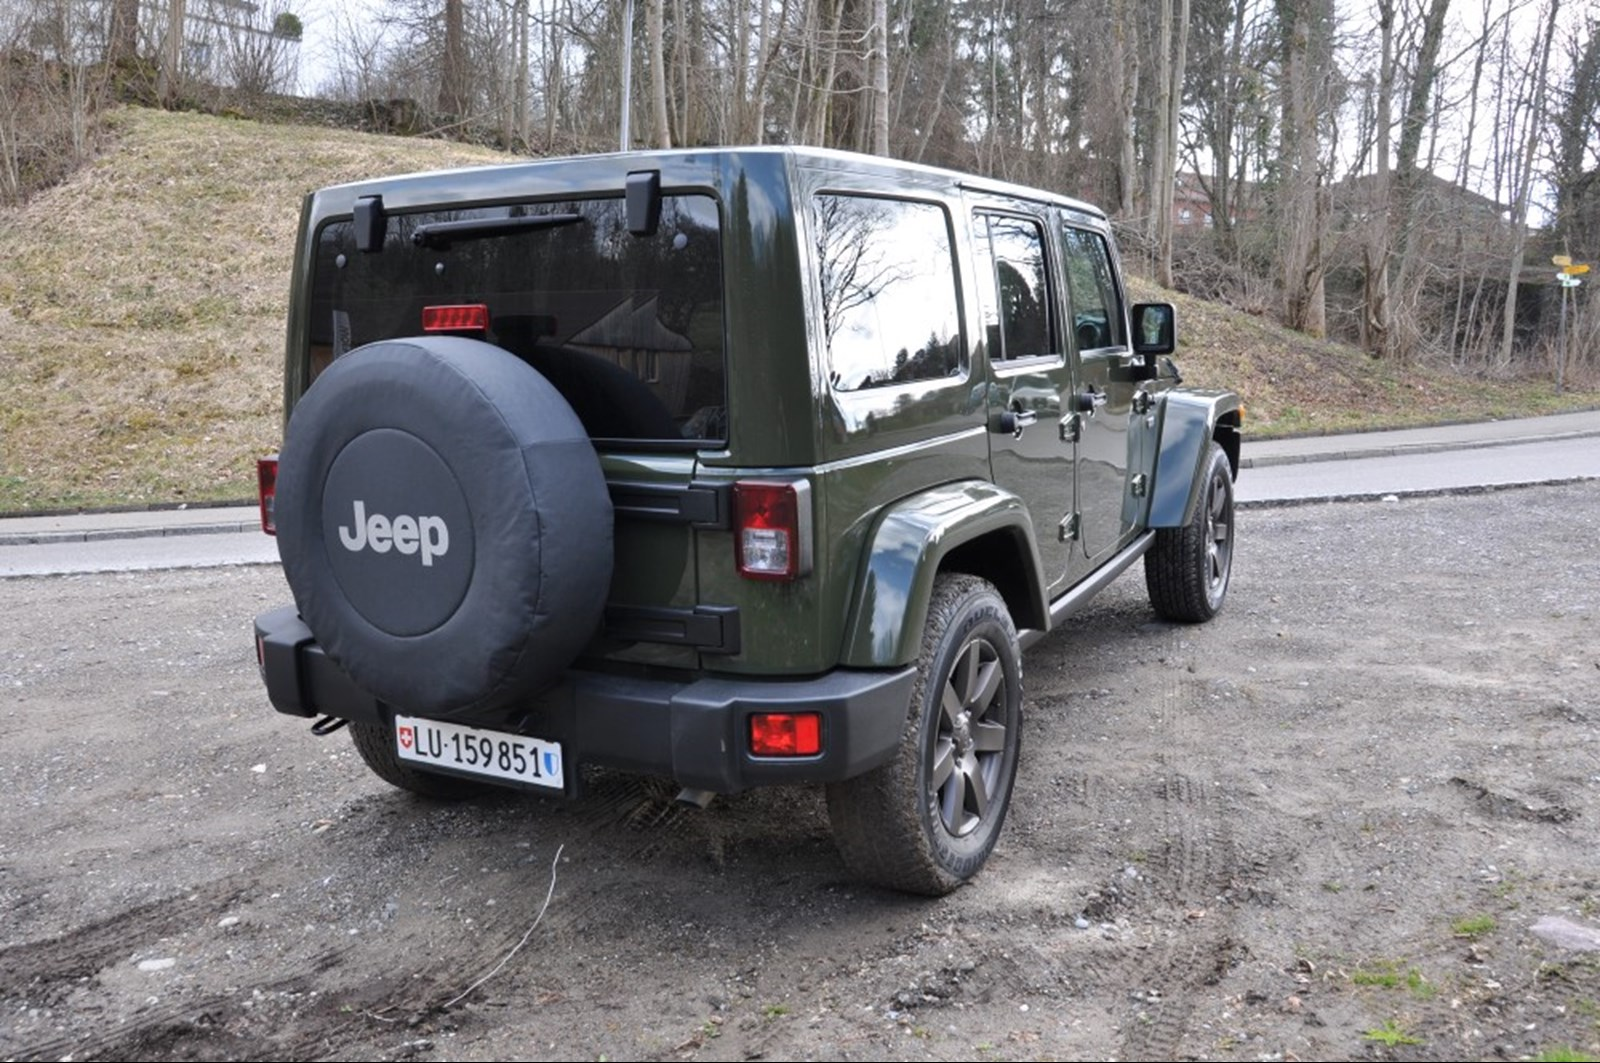 JEEP WRANGLER - Testbericht Jeep Wrangler (2016) – 75 Jahre Matsch ...